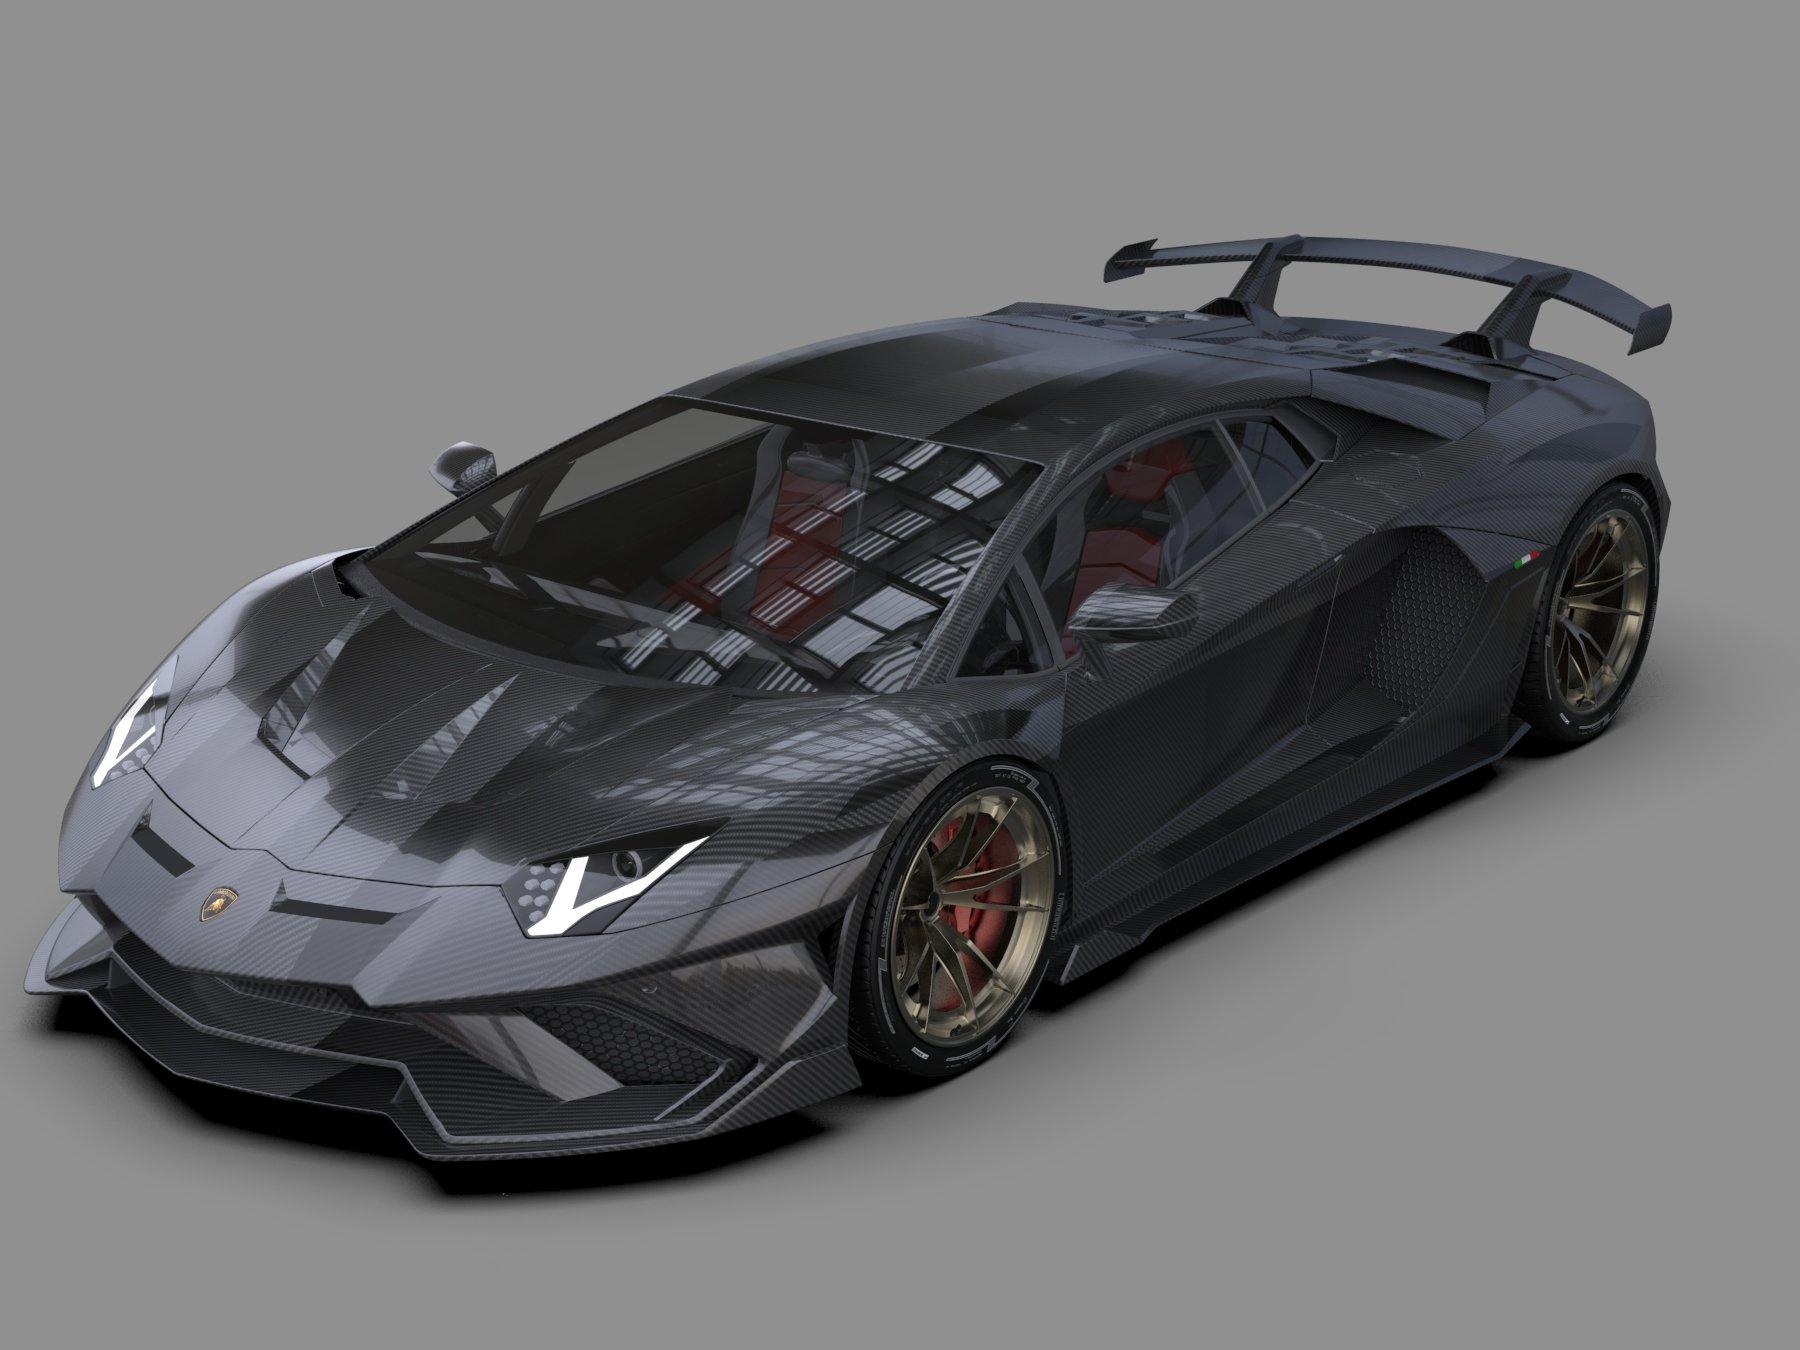 Lamborghini_Aventador_by_Duke_Dynamics_0009